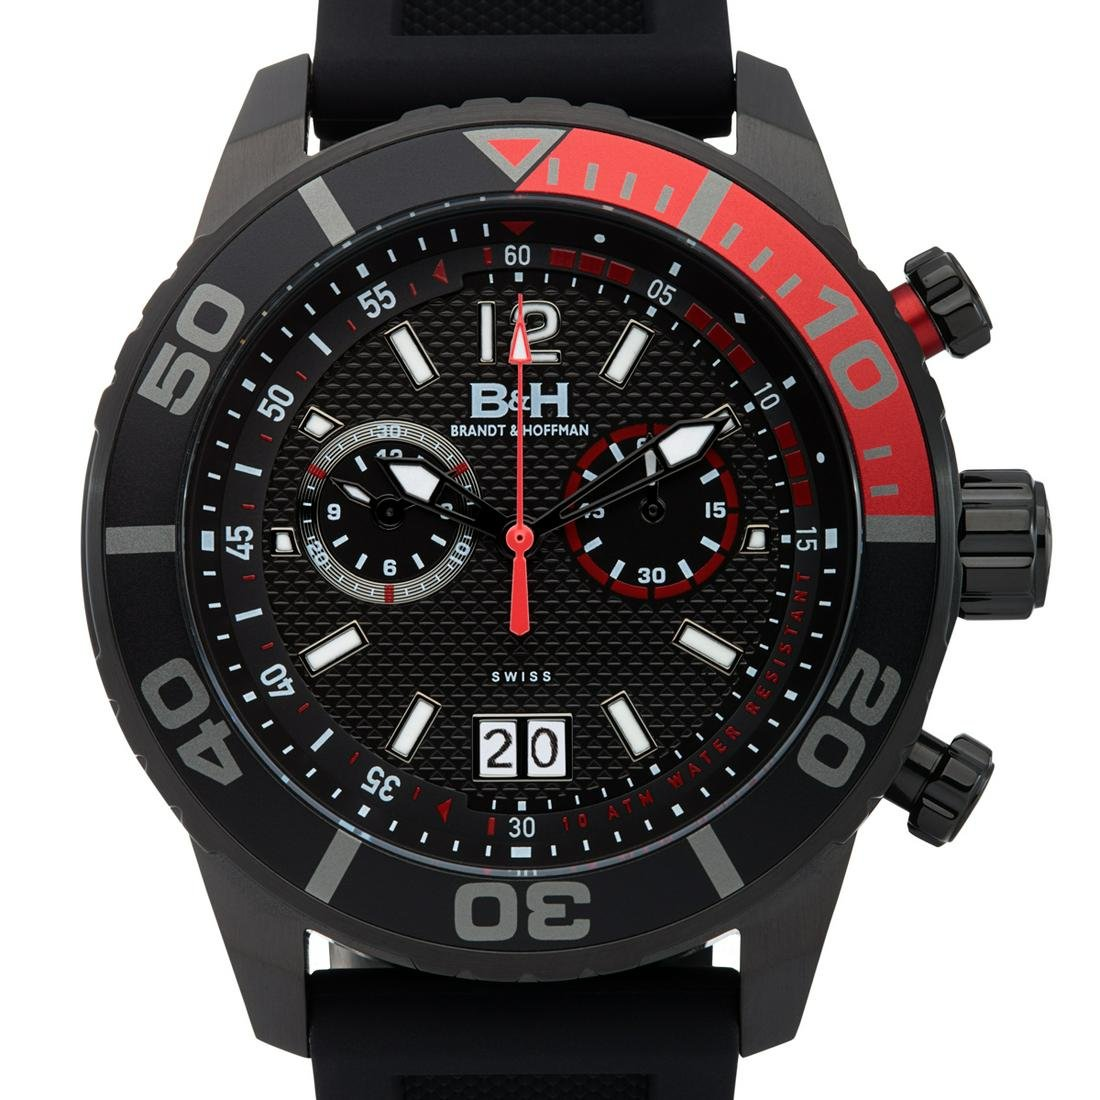 Brandt & Hoffman Swiss Chronograph Bayliss Mens Watch